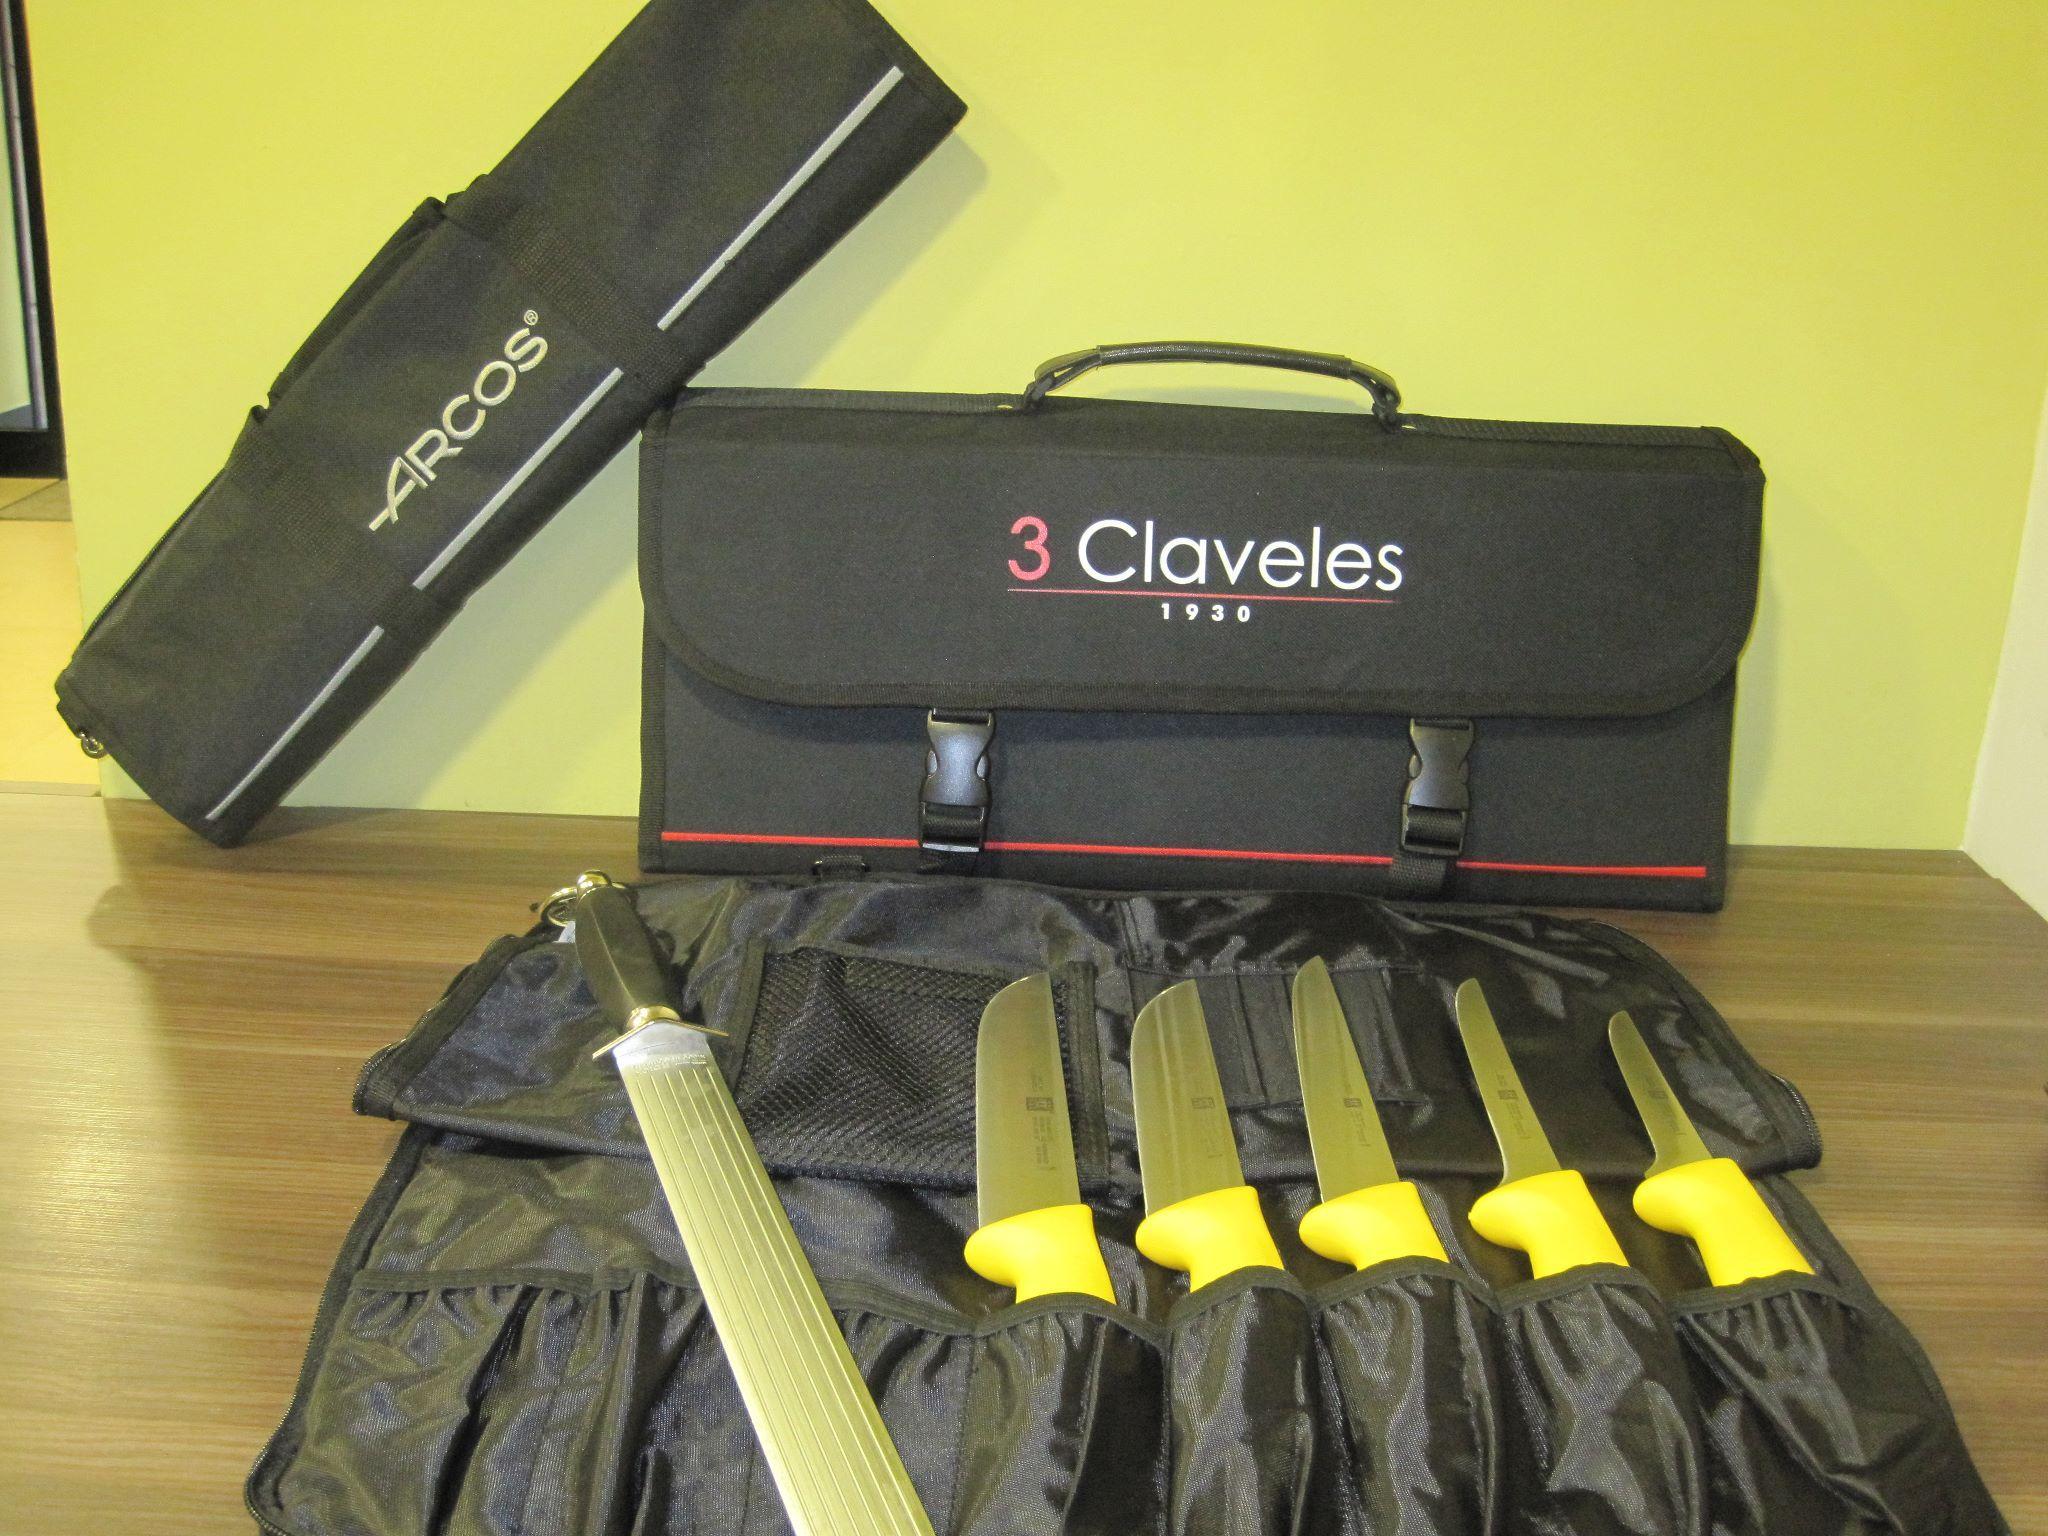 Foto 34 de Knives and penknives en Zaragoza | San Gil cutlery